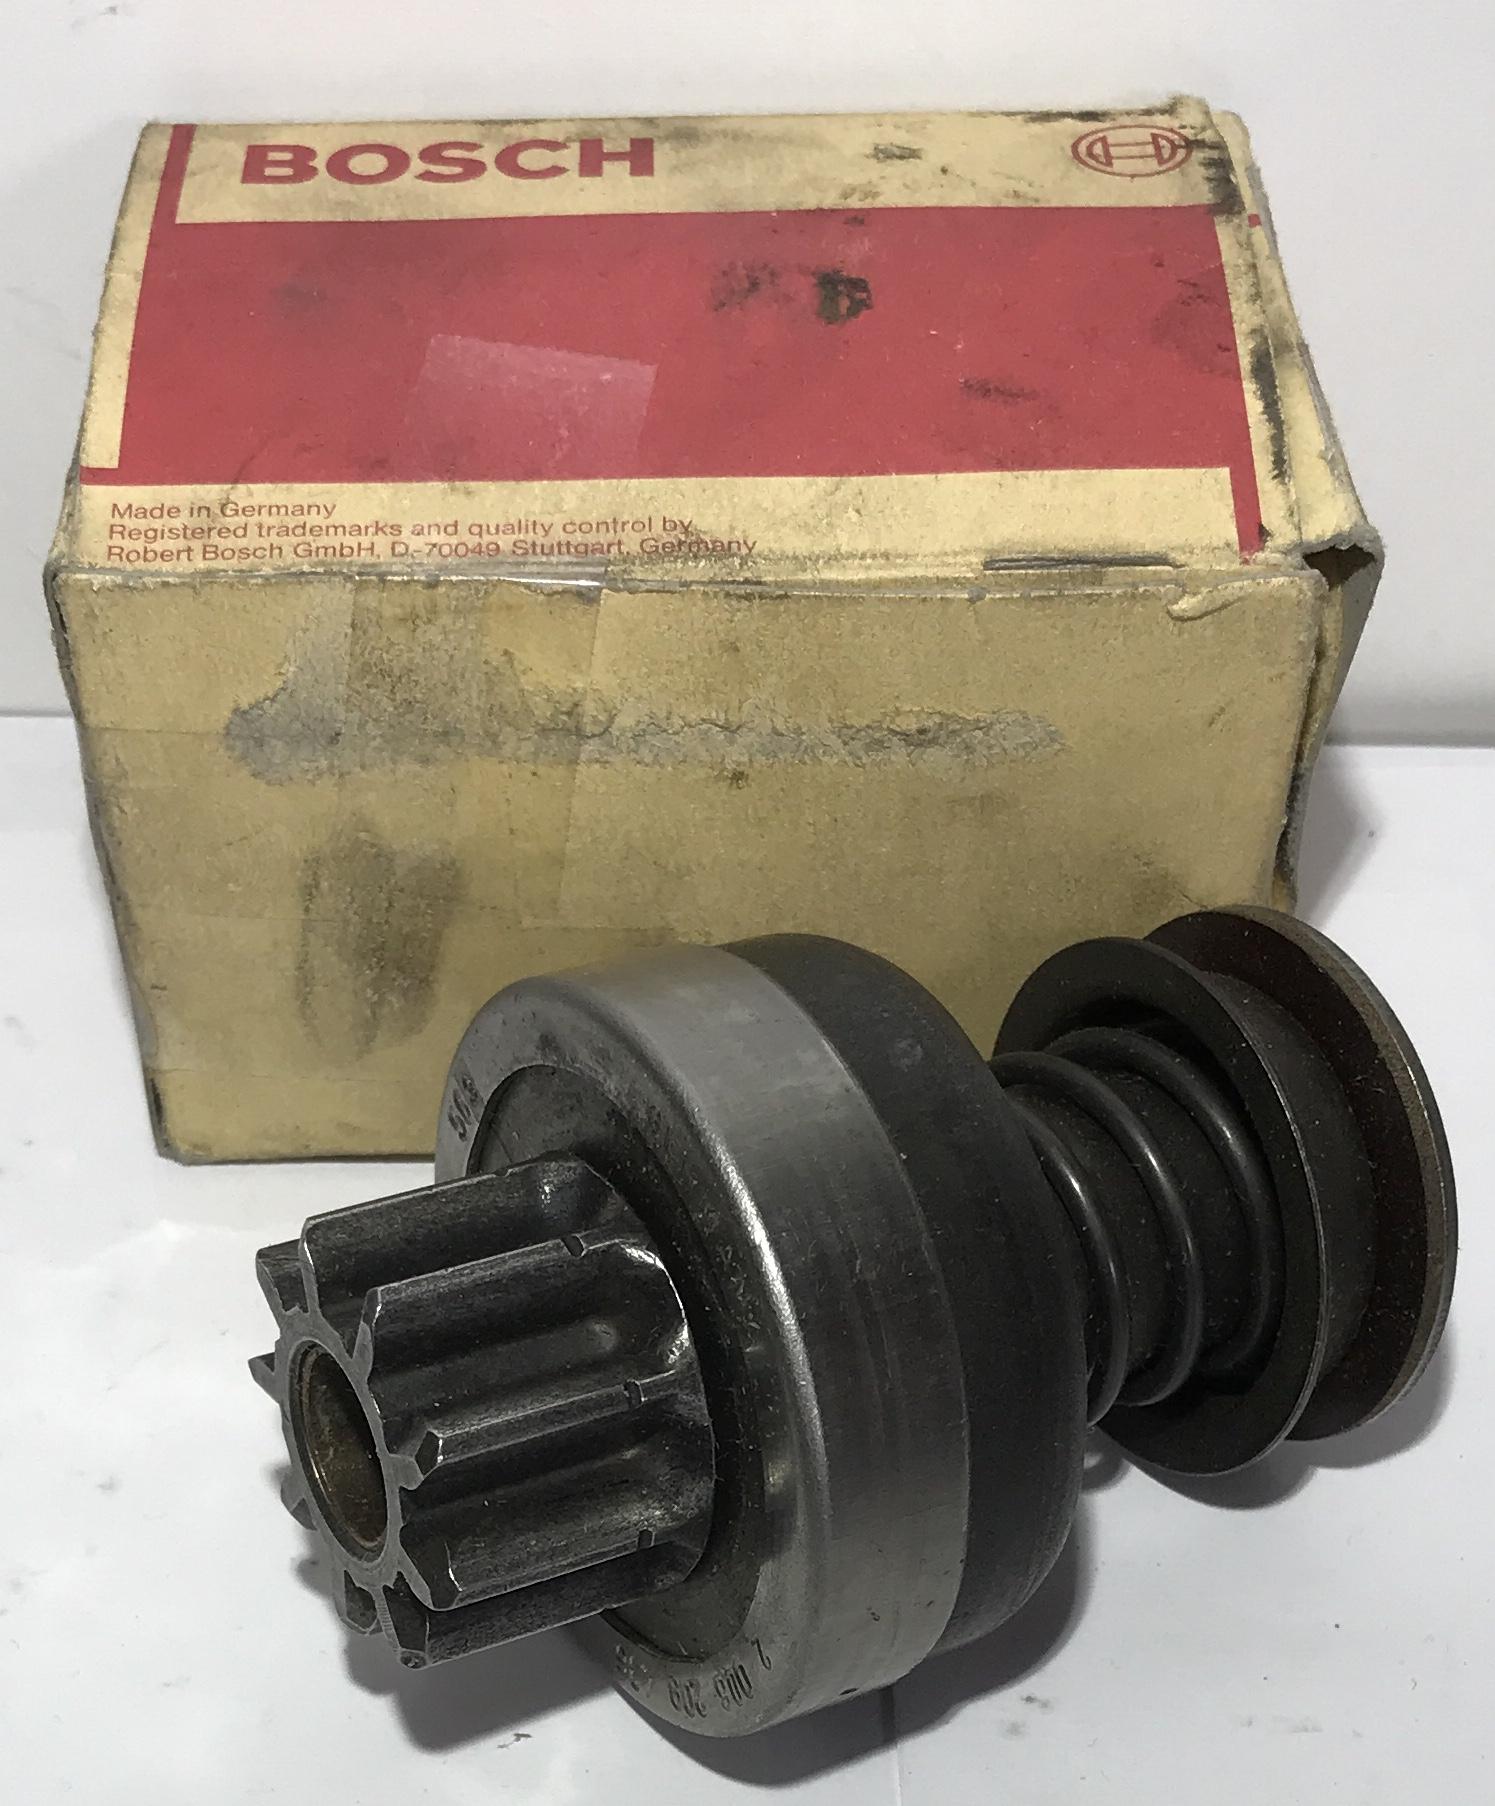 Bosch 2006209436 Ritzel Freilaufgetriebe Freilauf Pinion freewheel gear piñón